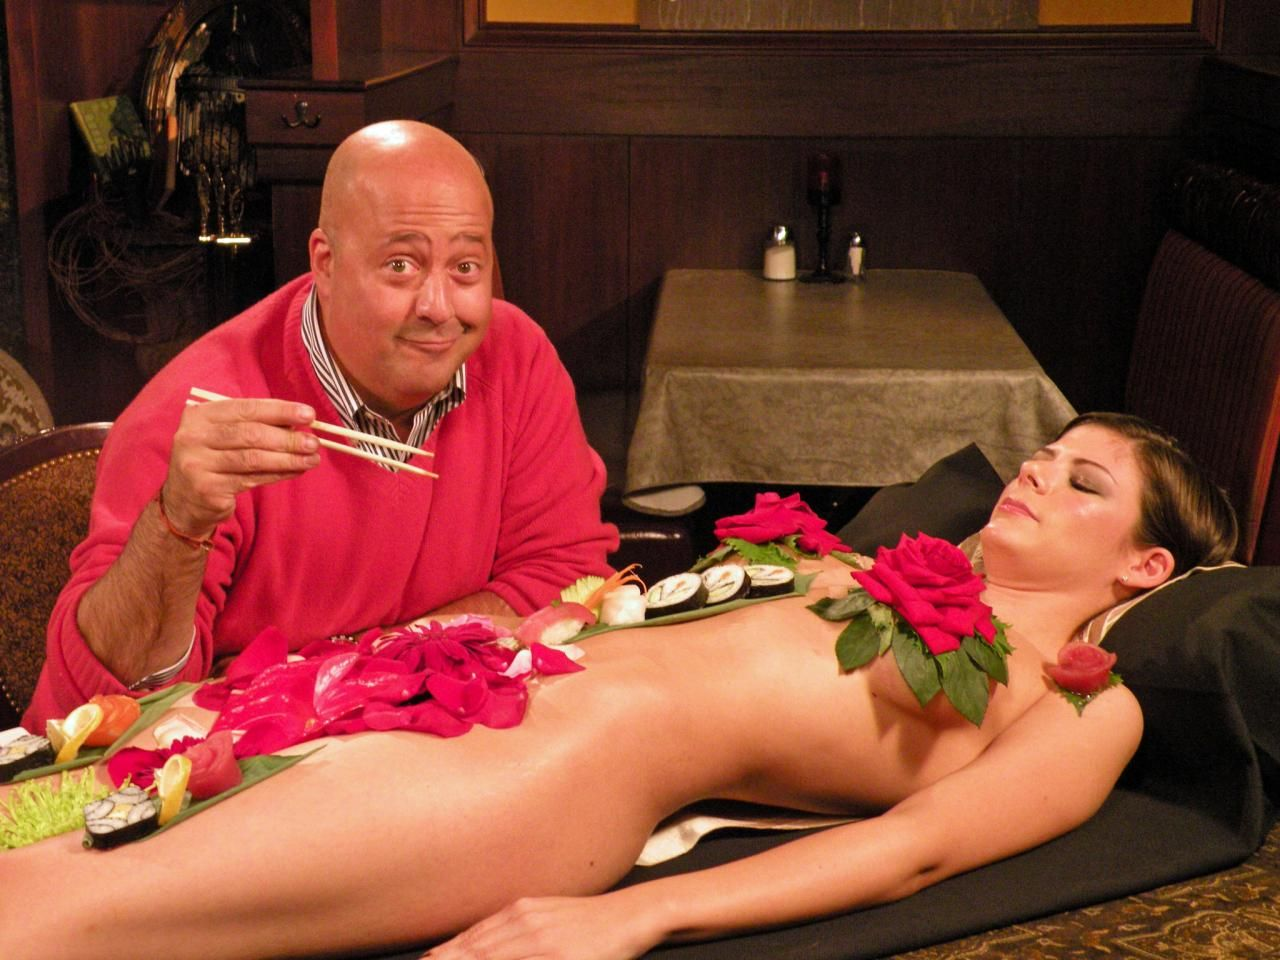 Hot sexy pissing porn flics online